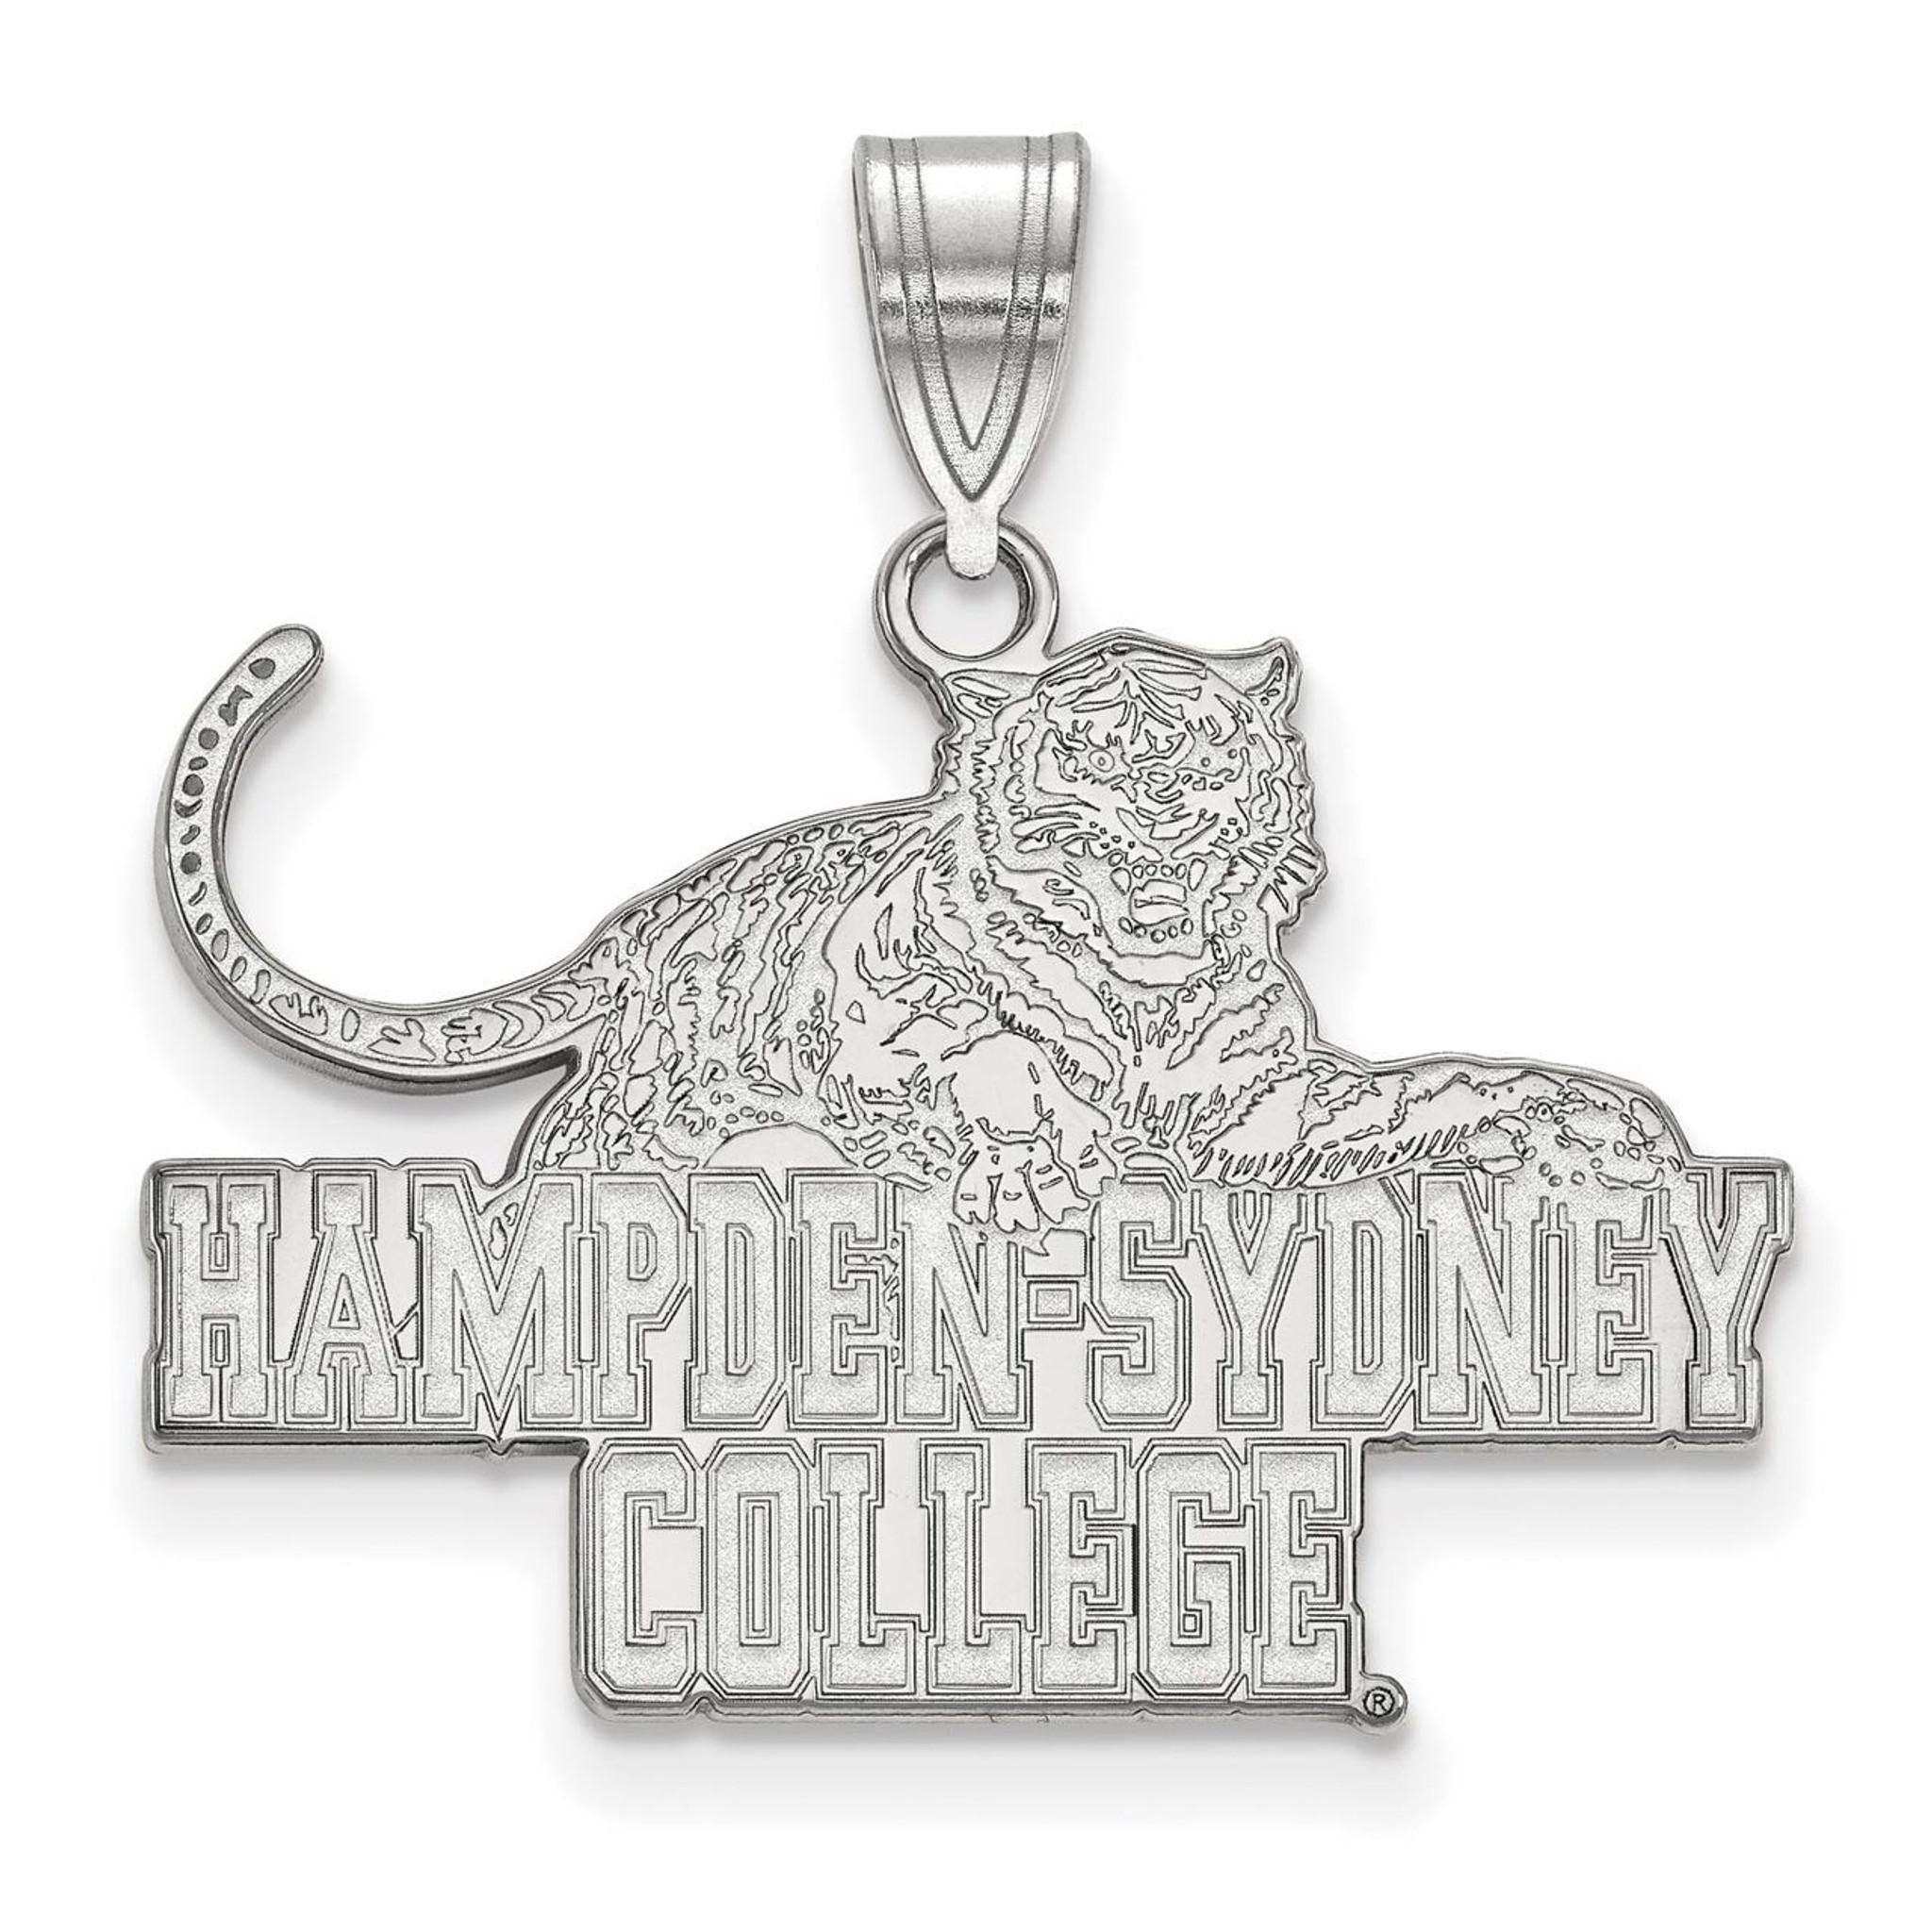 Hampden Sydney College Large Pendant 10k White Gold